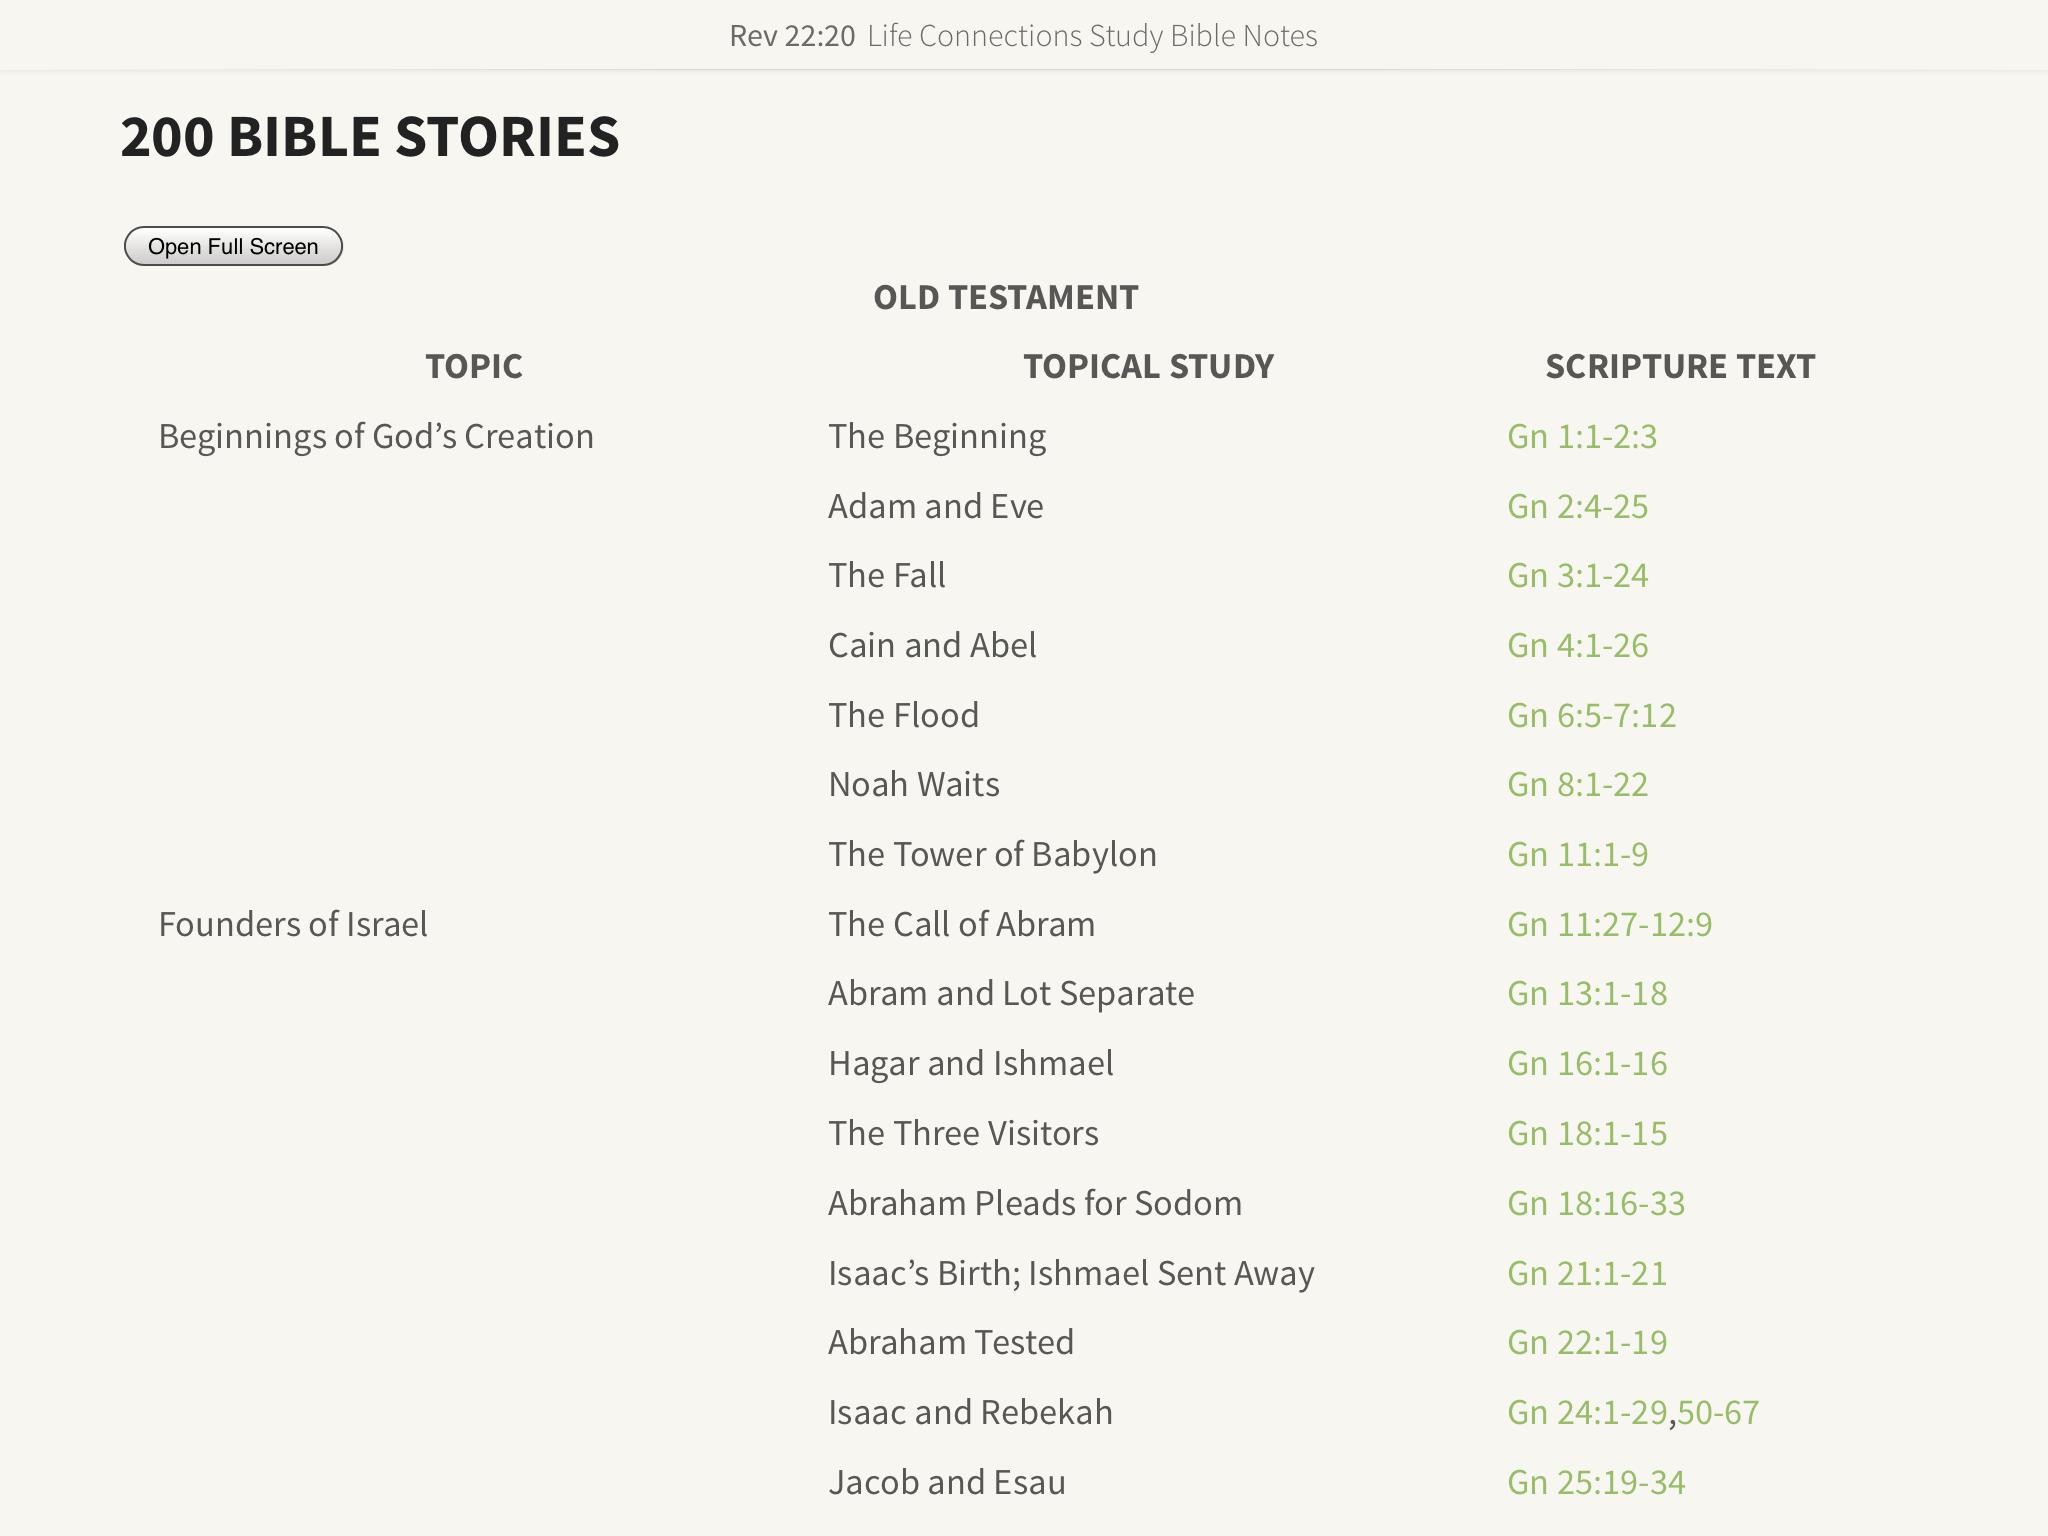 200 bible stories